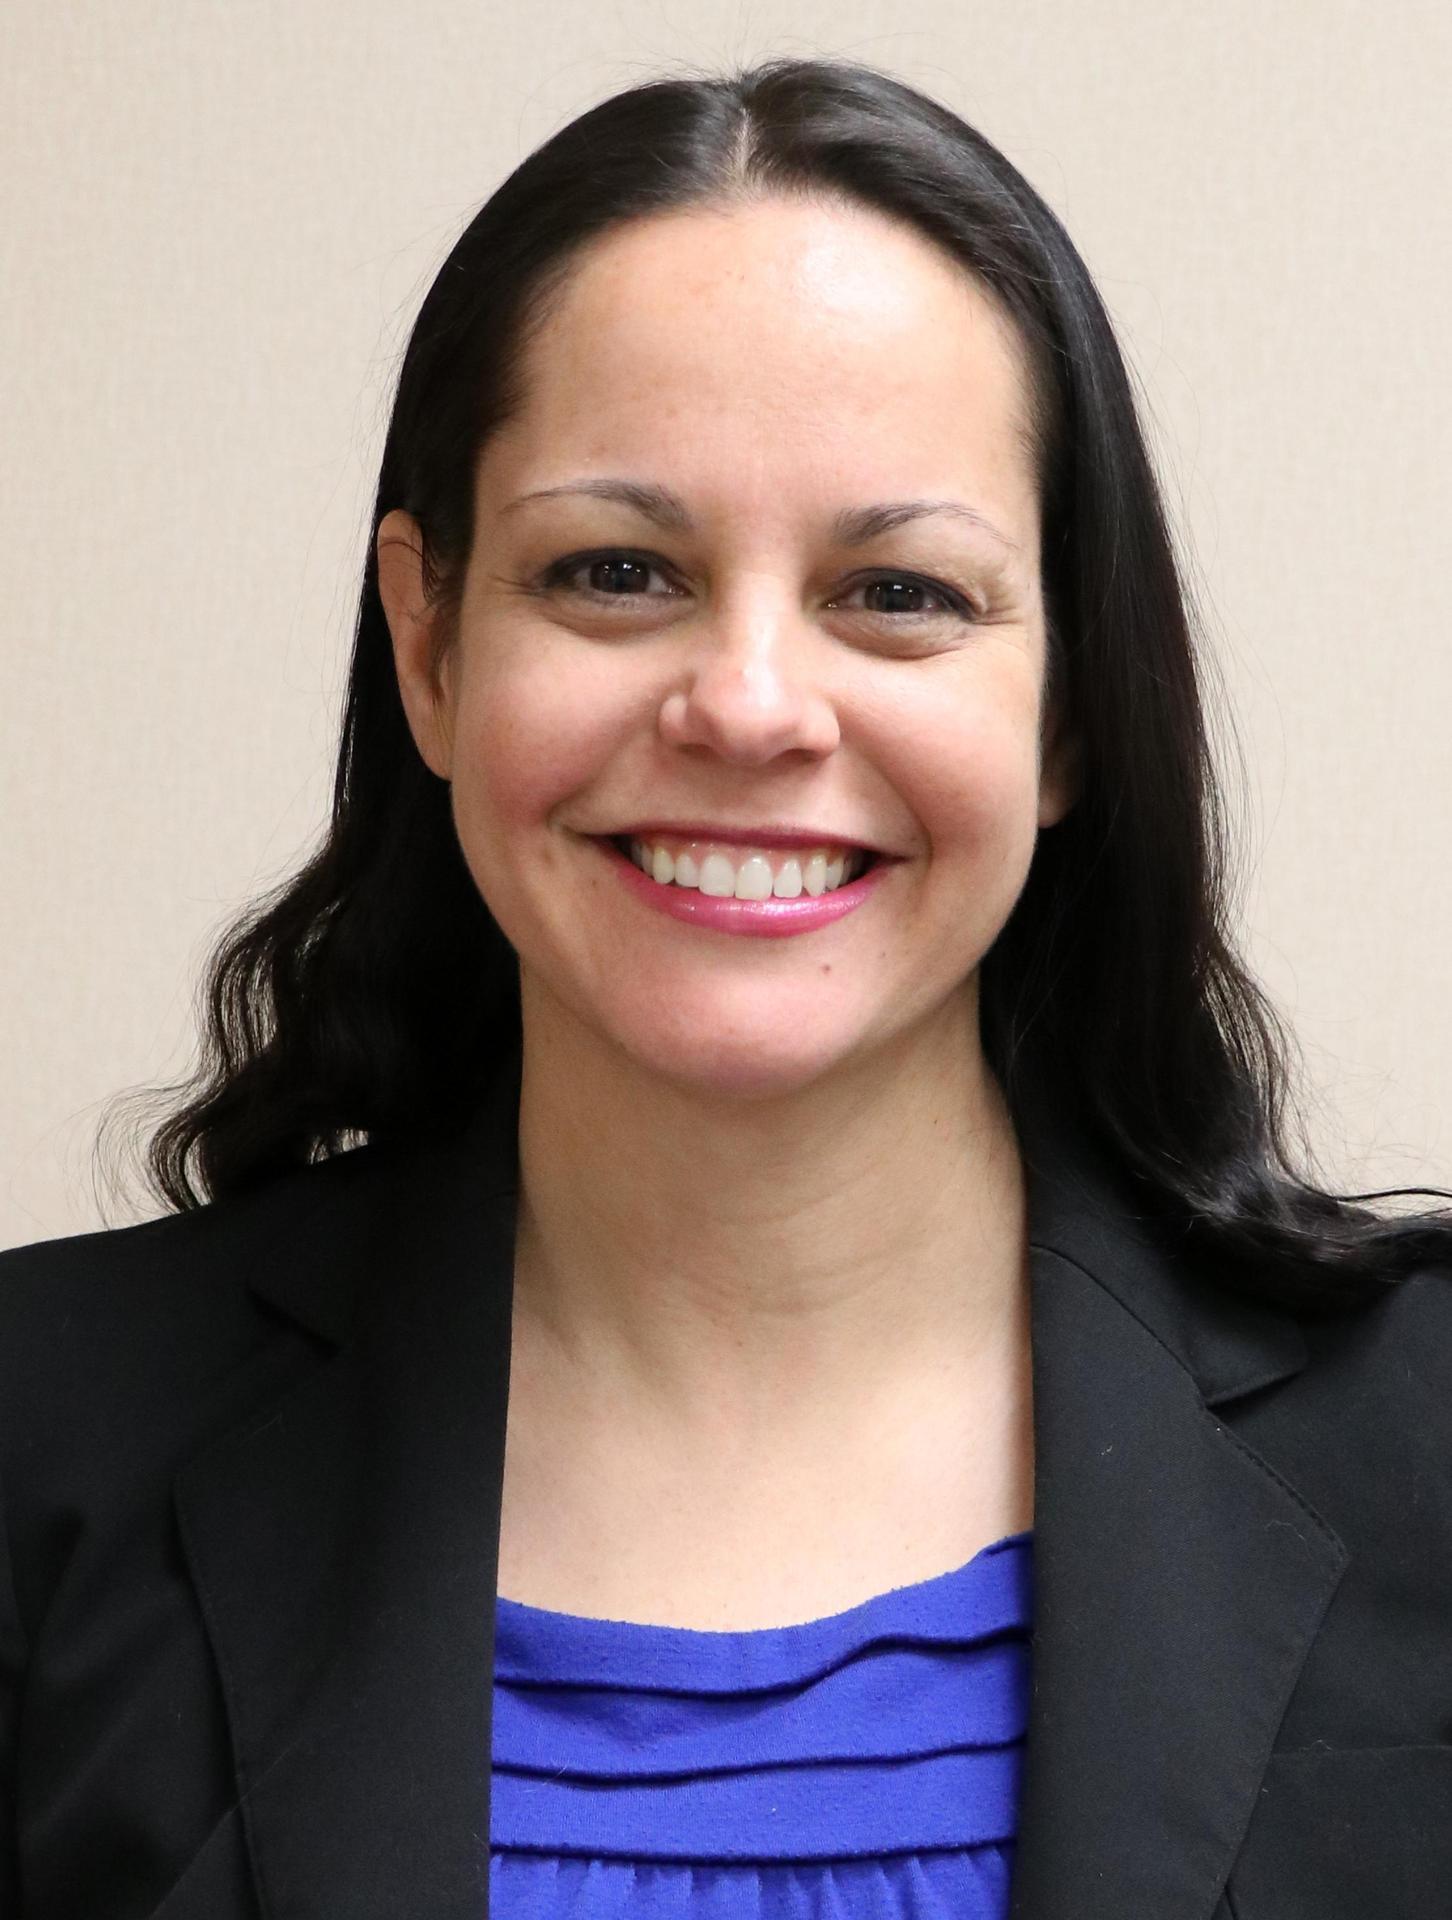 LeAnne Perkowski